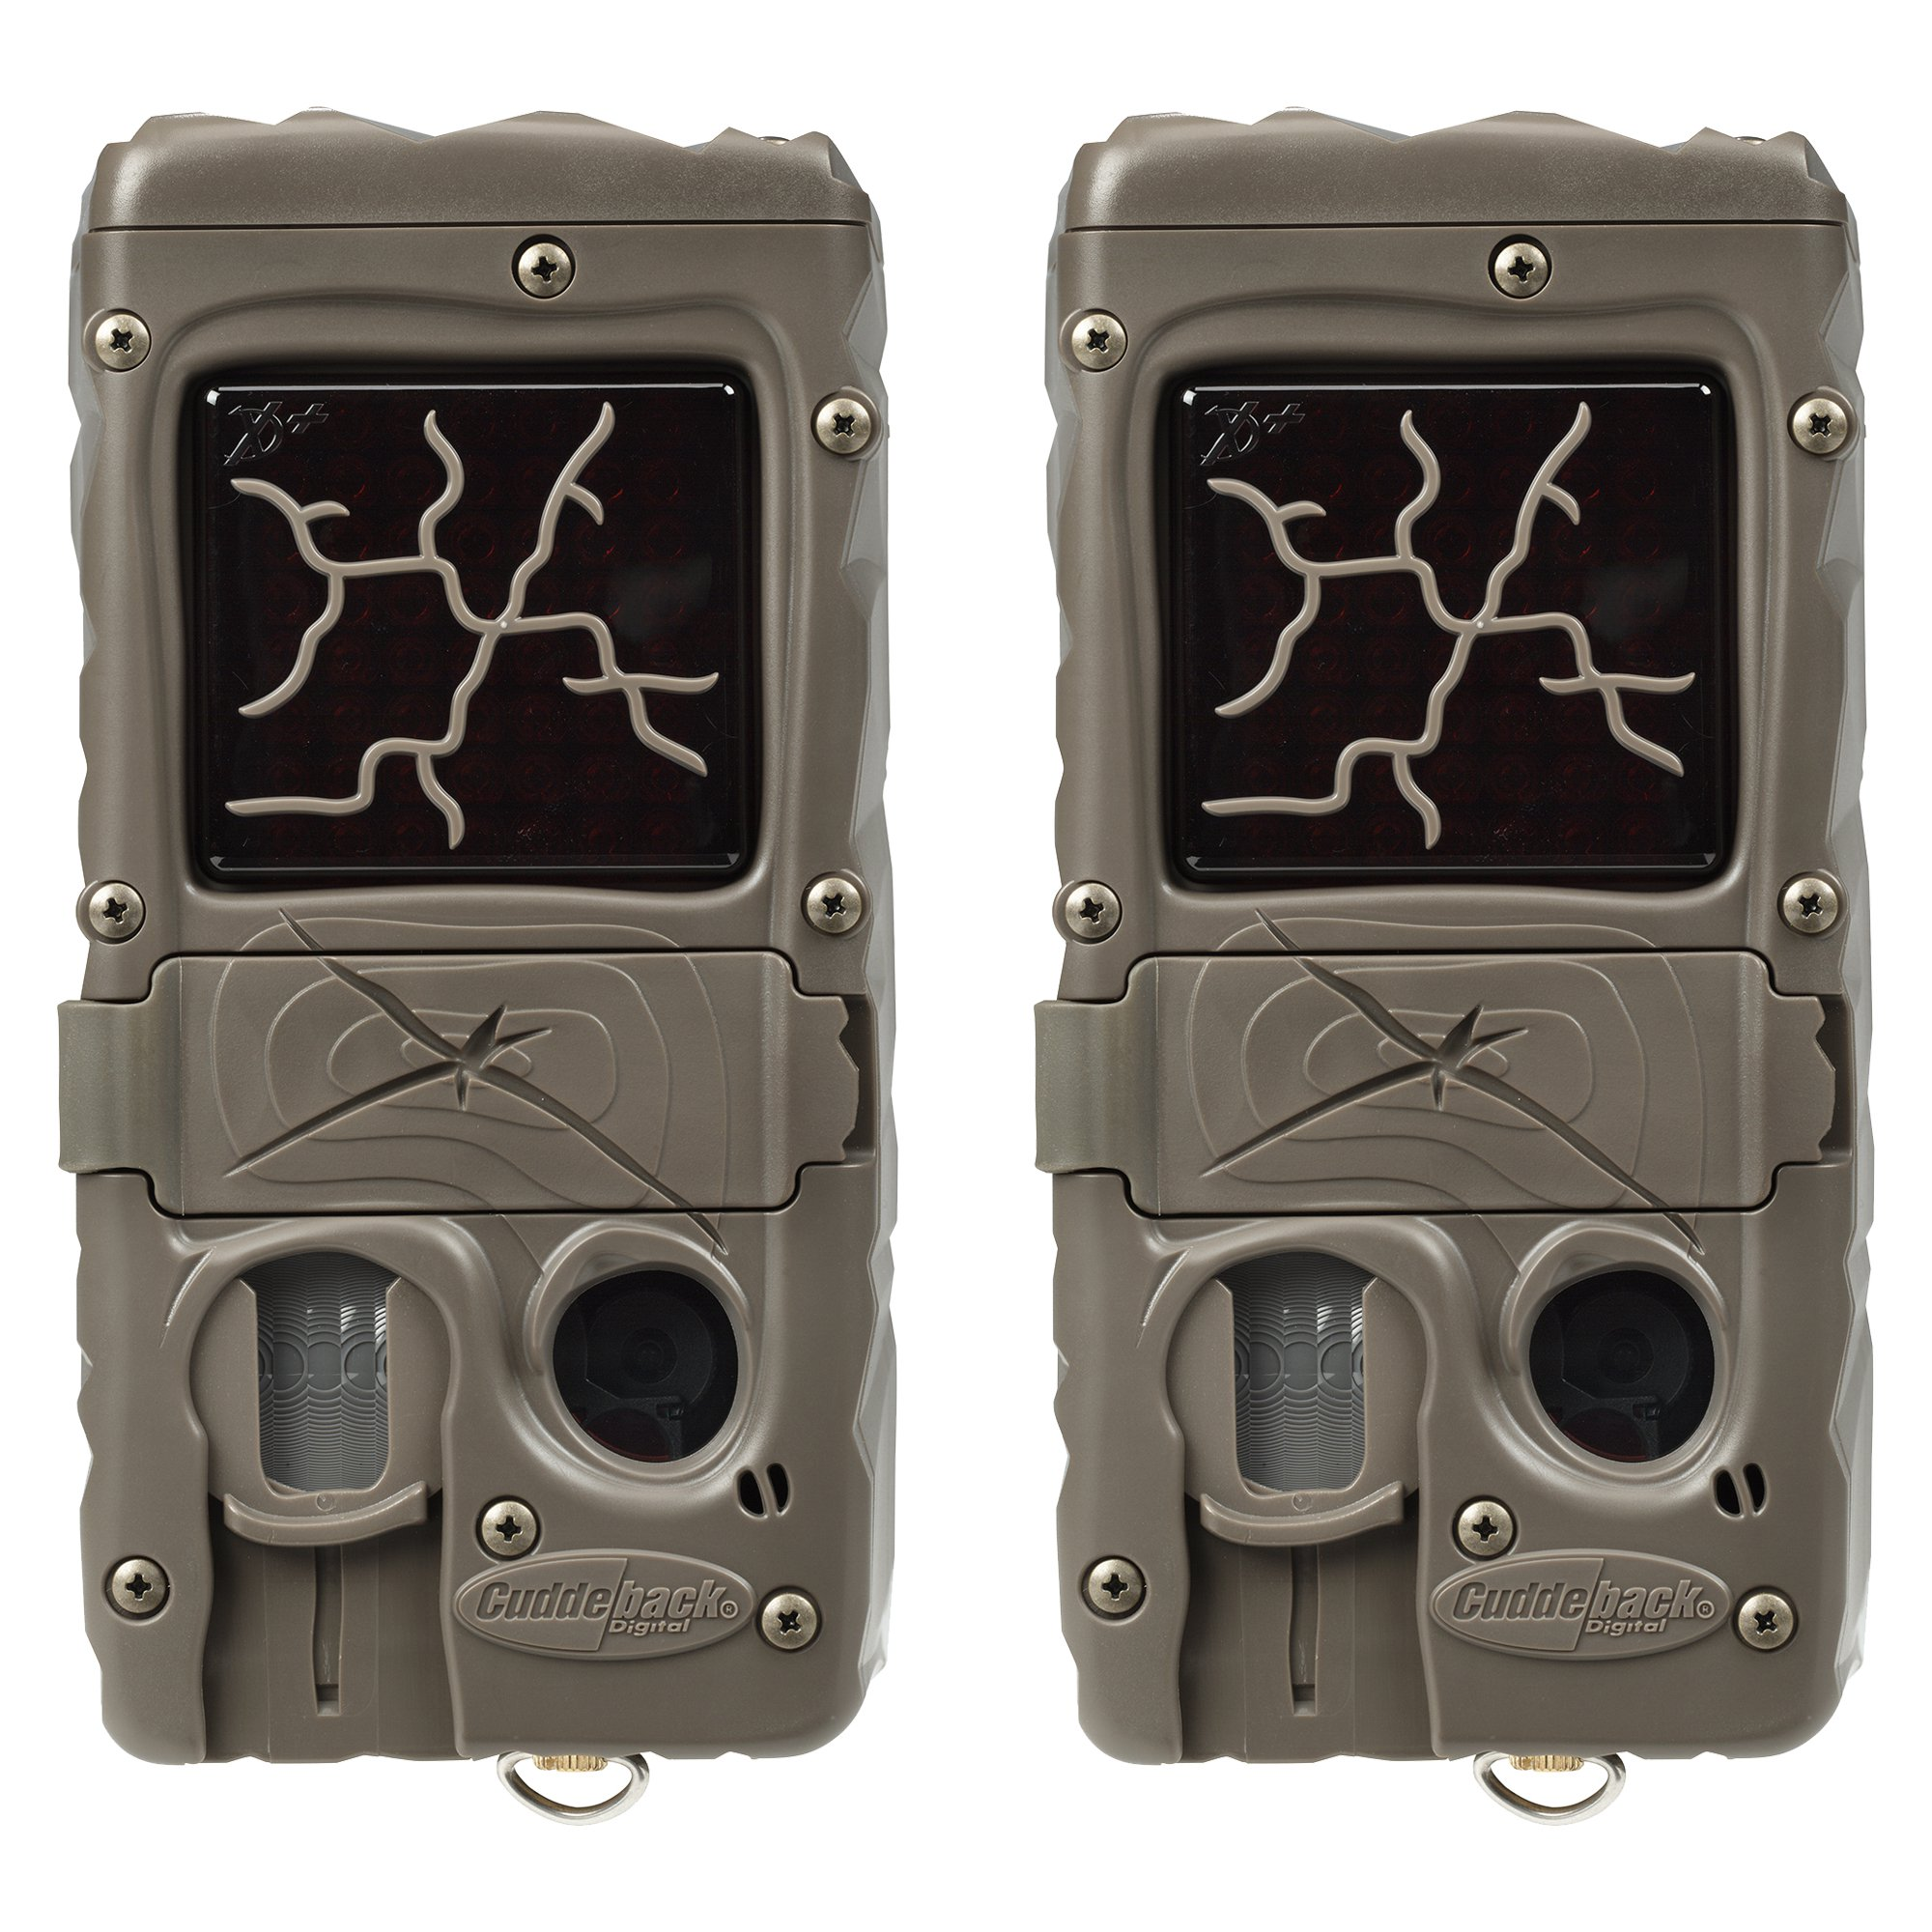 Cuddeback Dual Flash 20MP Invisible Infrared Game Trail C...